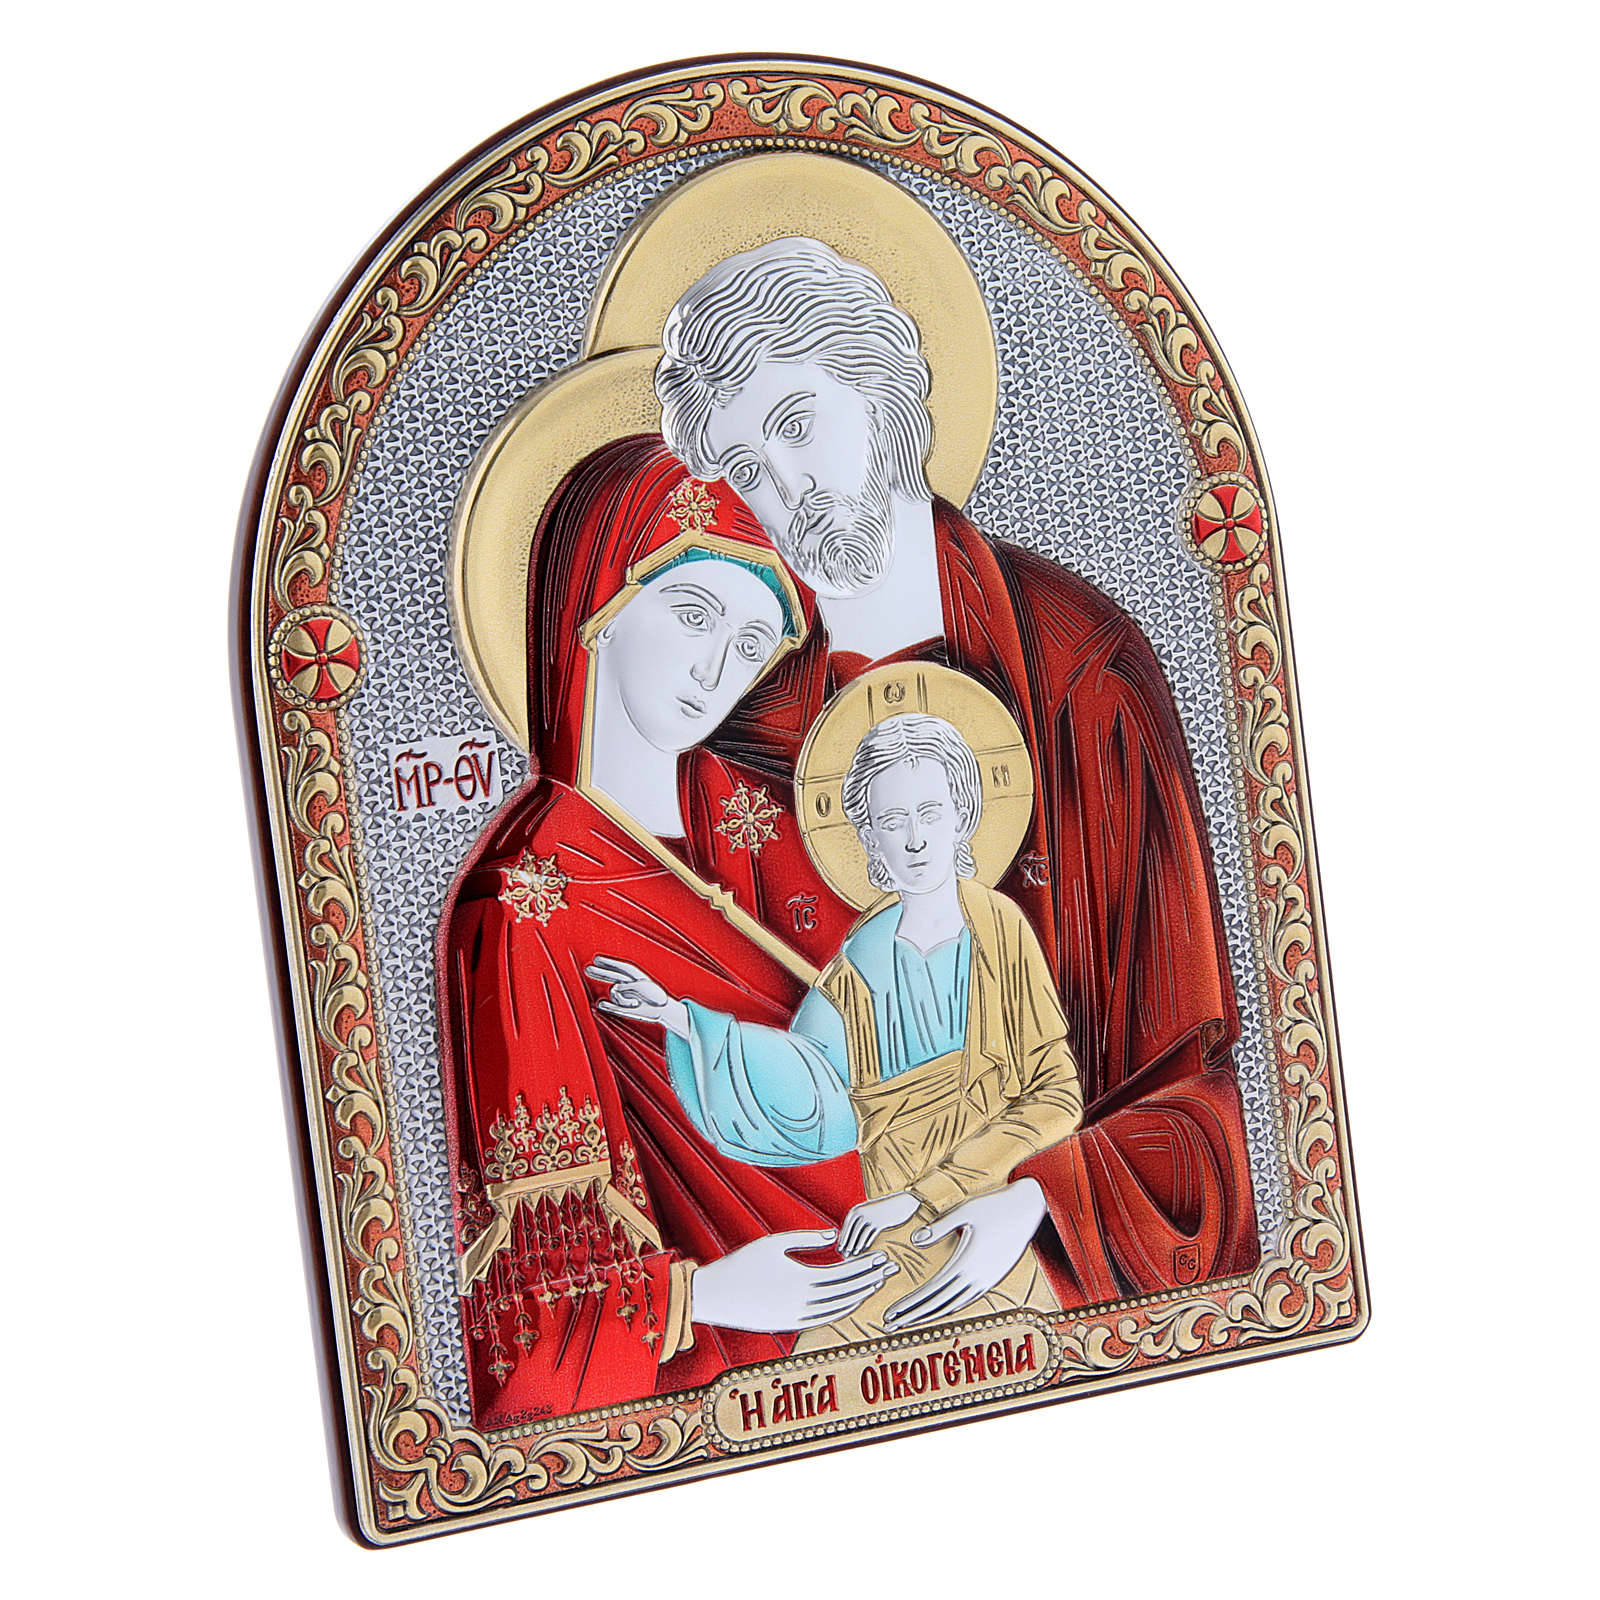 Cuadro Sagrada Familia roja bilaminado parte posterior madera preciosa detalles oro 16,7X13,6 cm 4